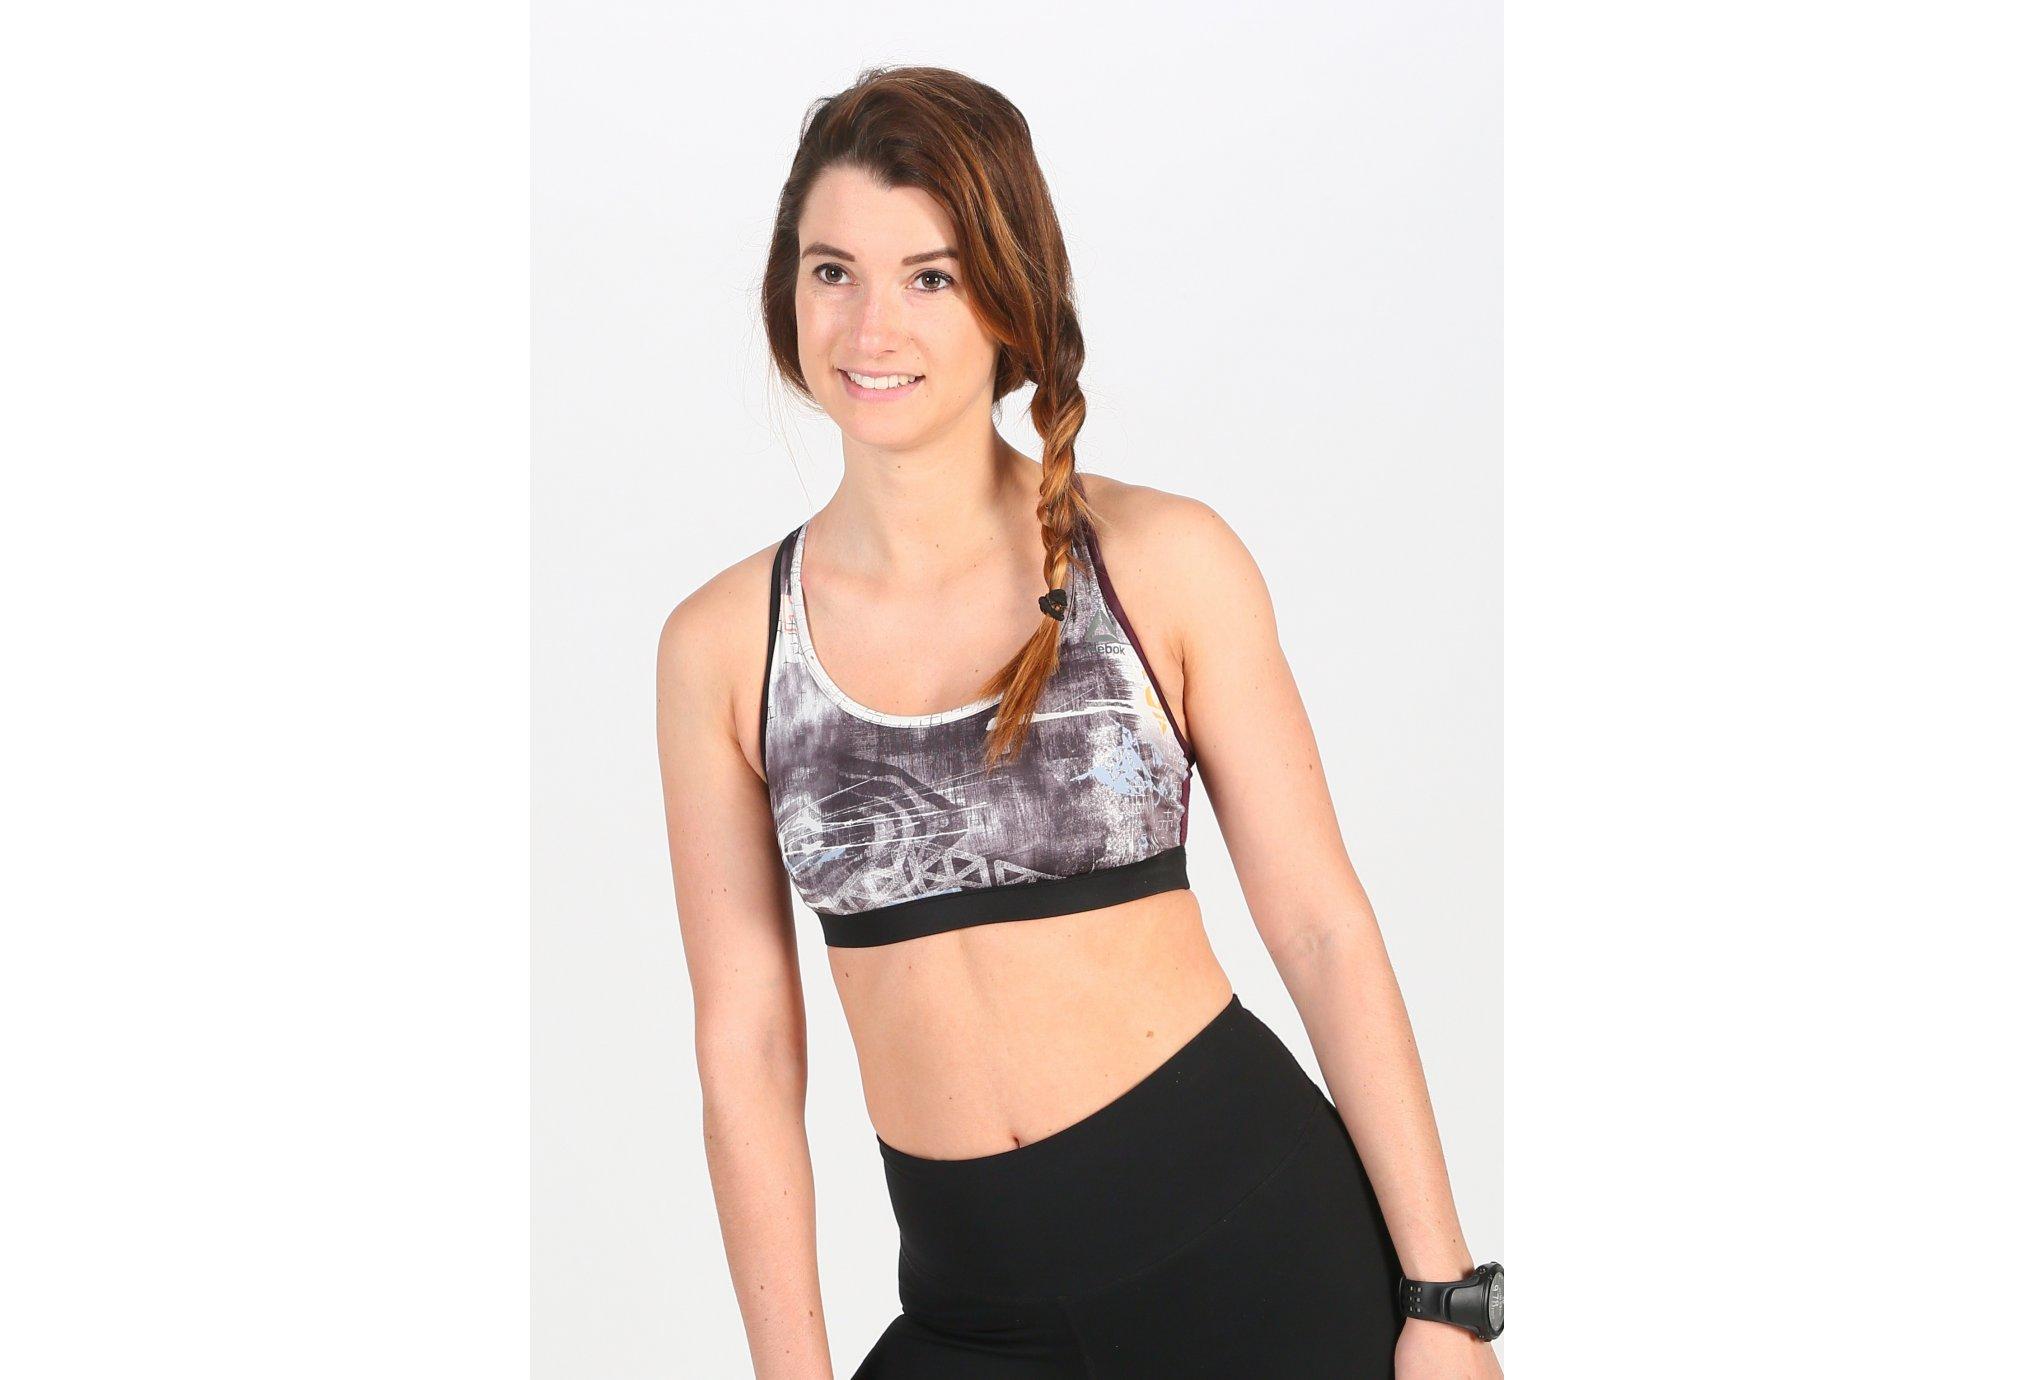 Reebok Spartan Race Sports W Diététique Vêtements femme